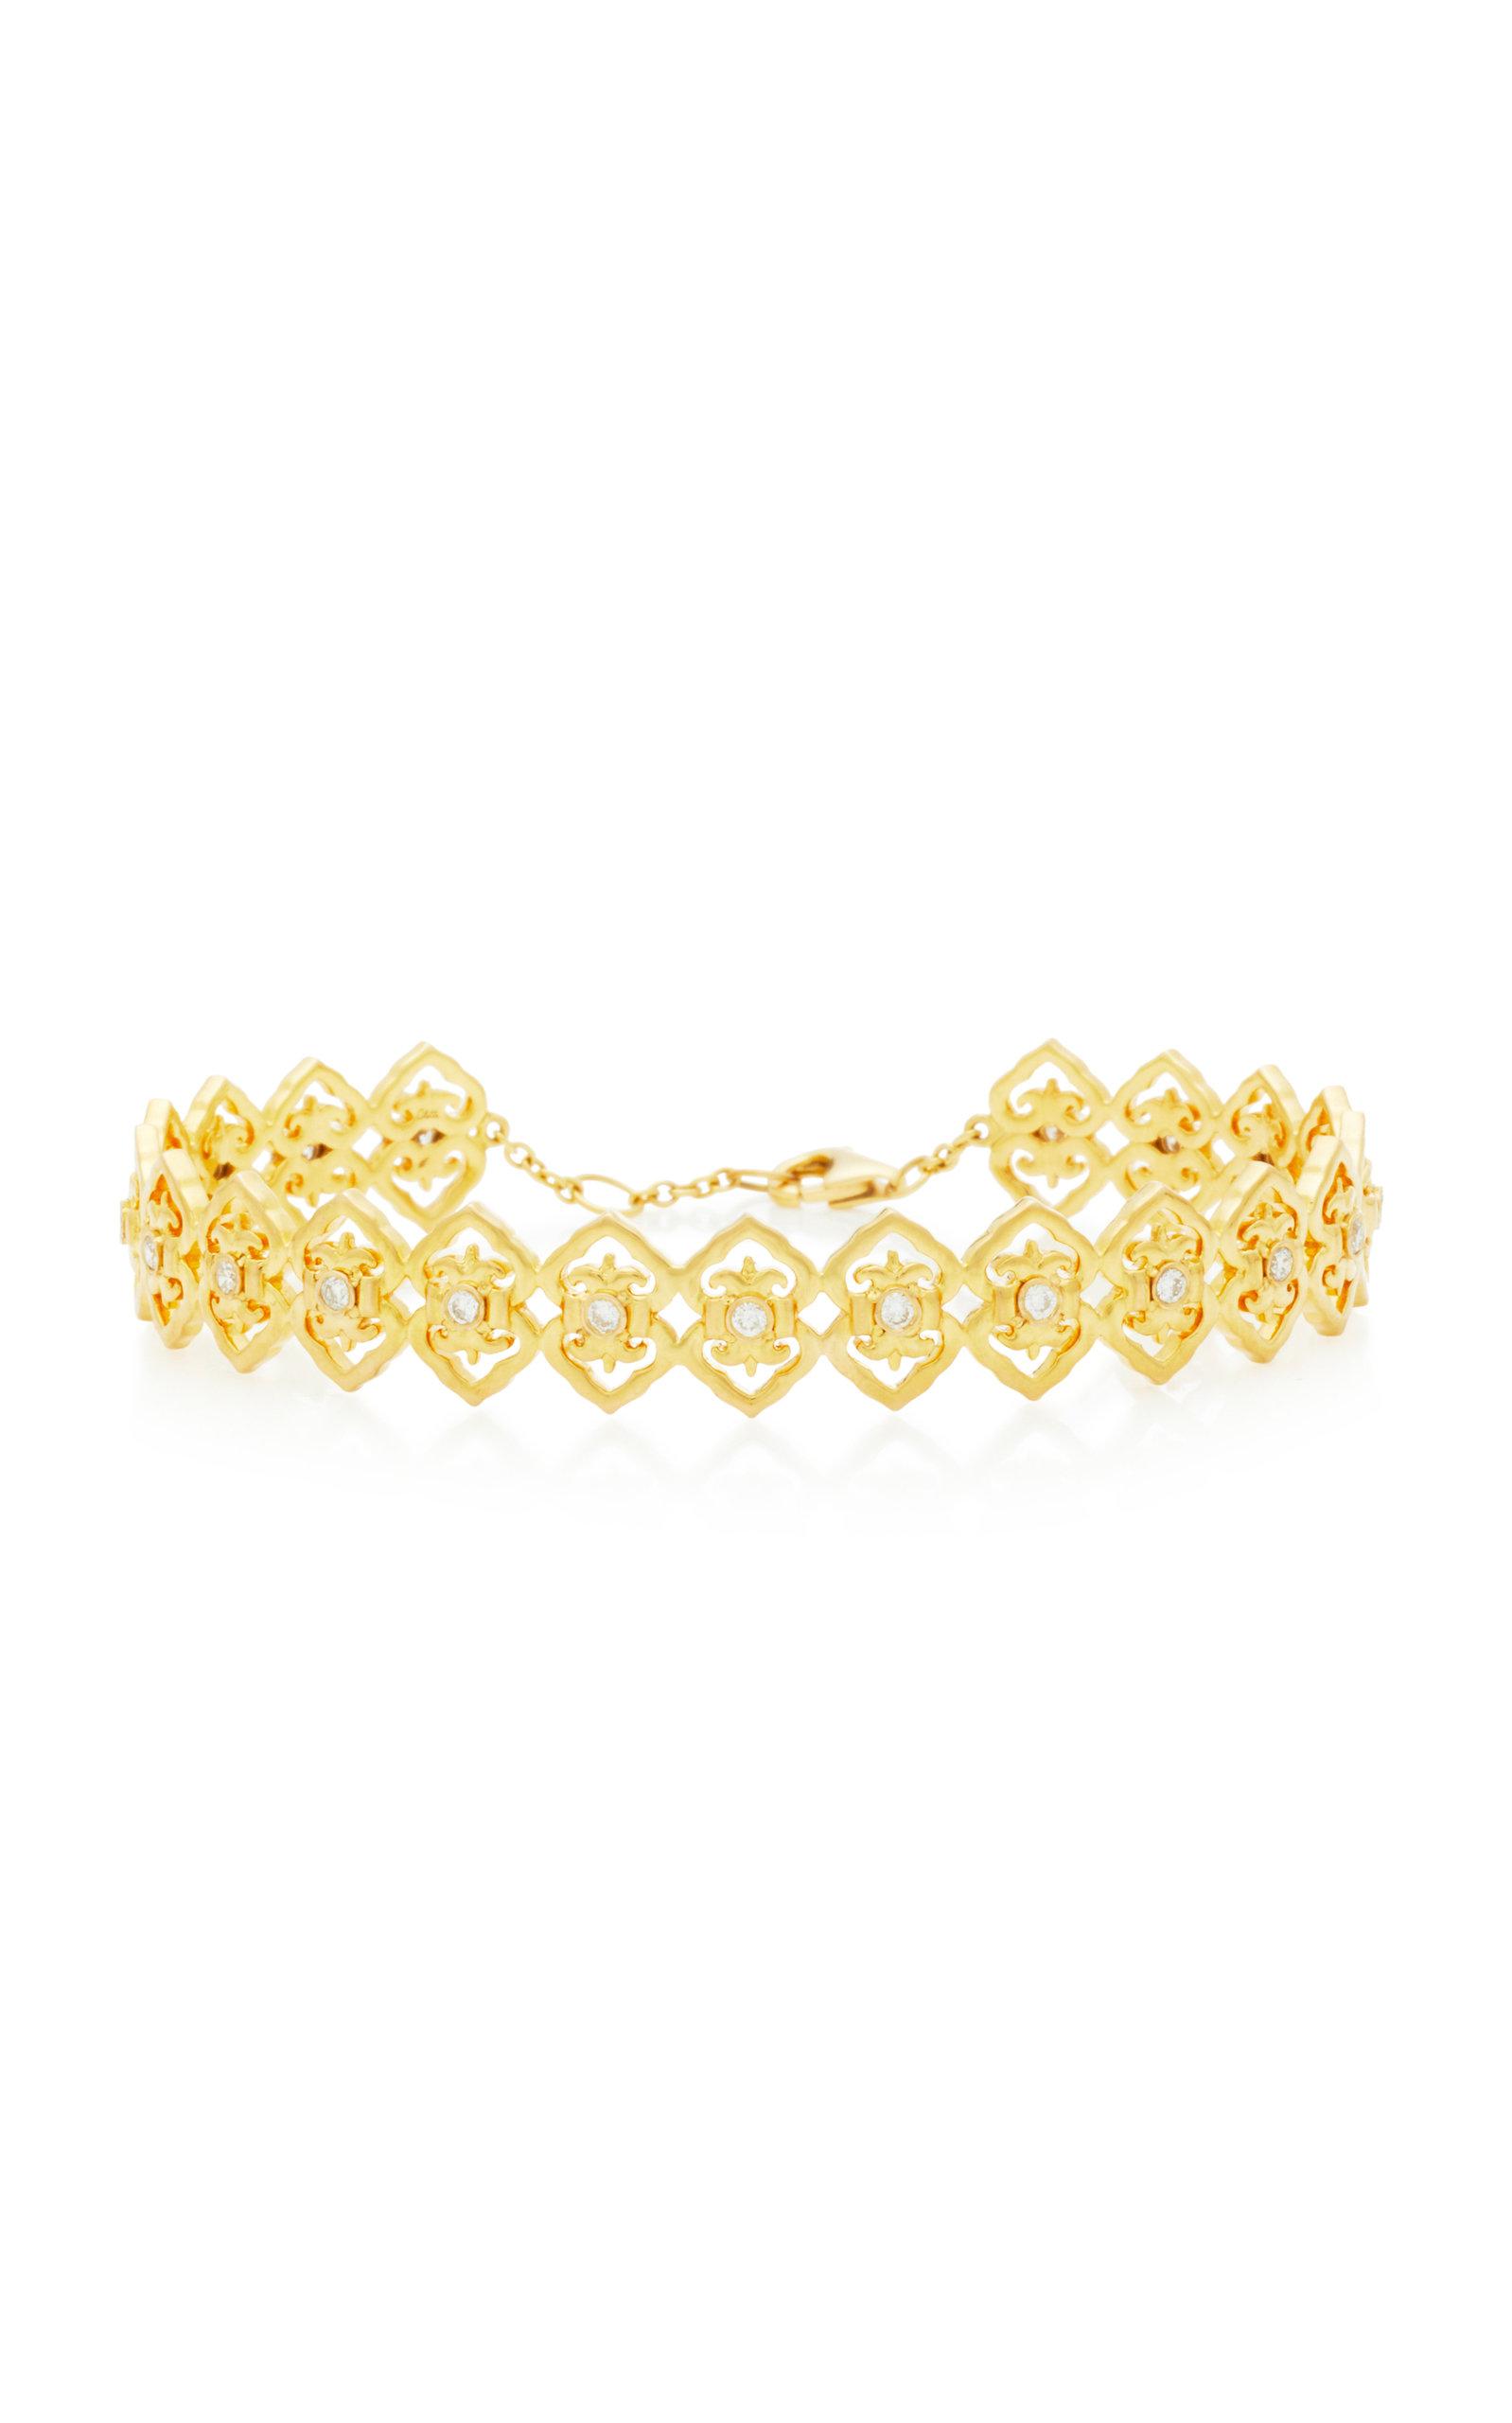 COLETTE JEWELRY Motif 18K Gold And Diamond Bracelet